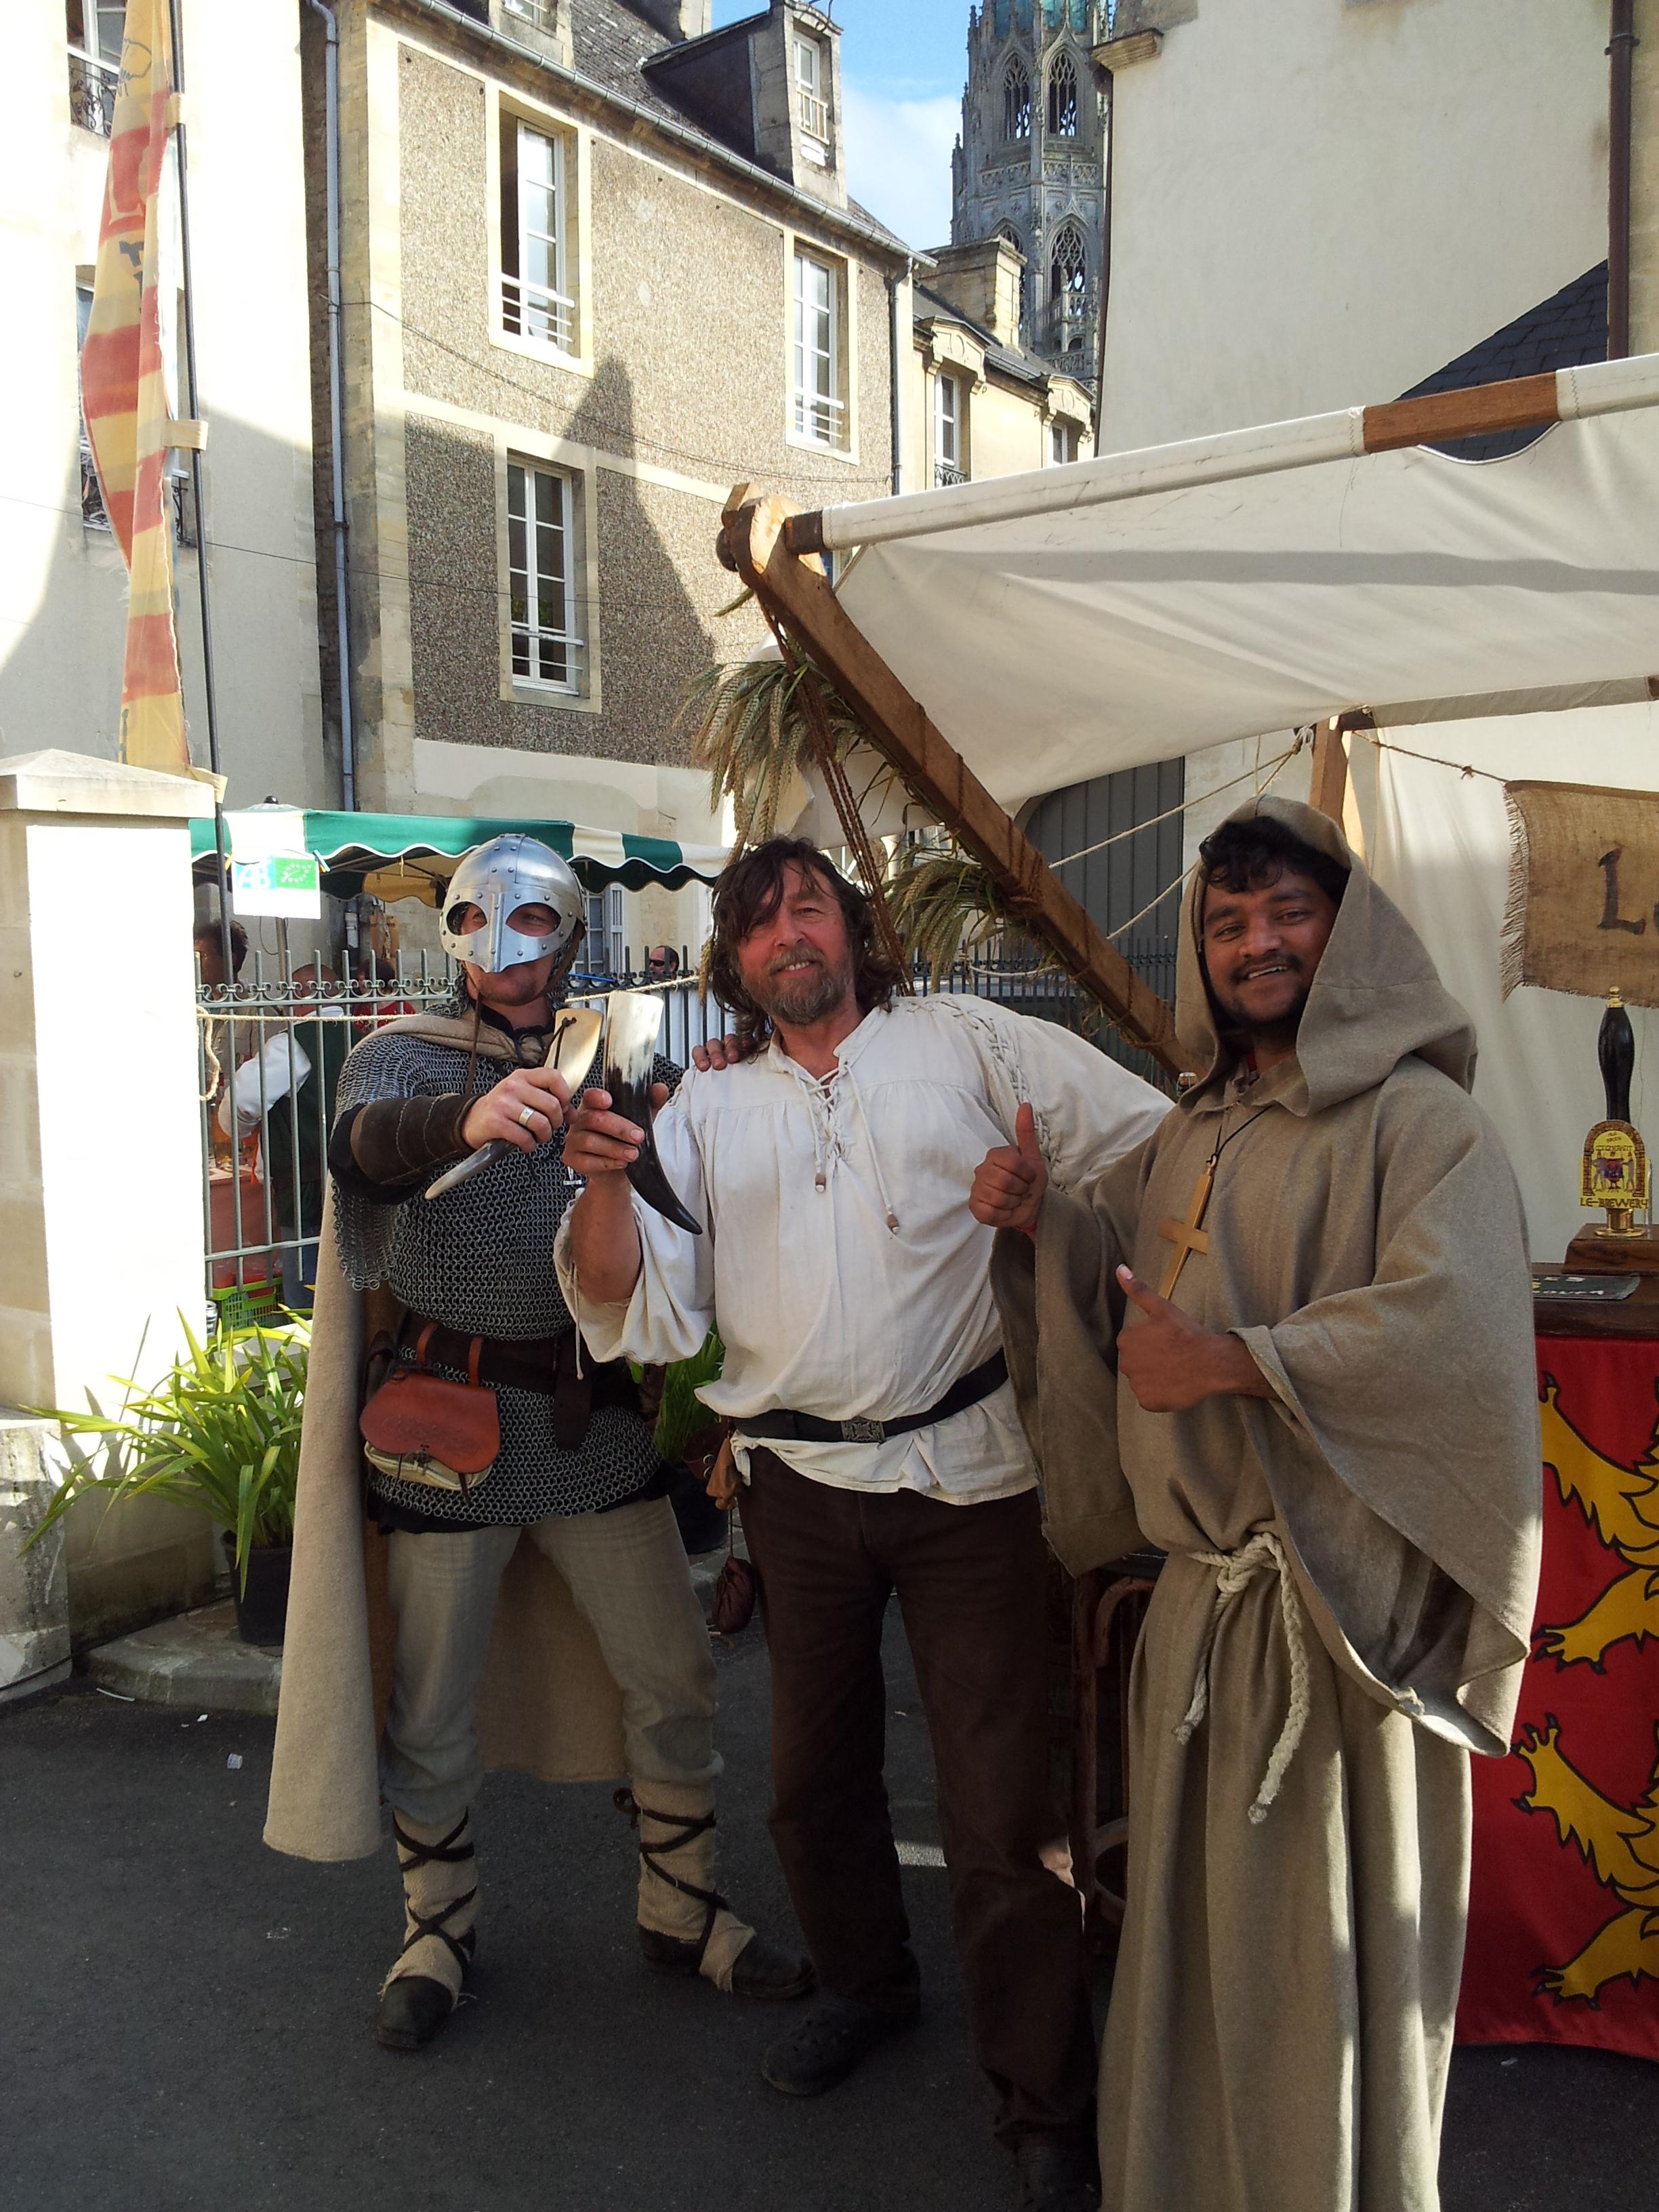 Medival Festival Bayeux, France